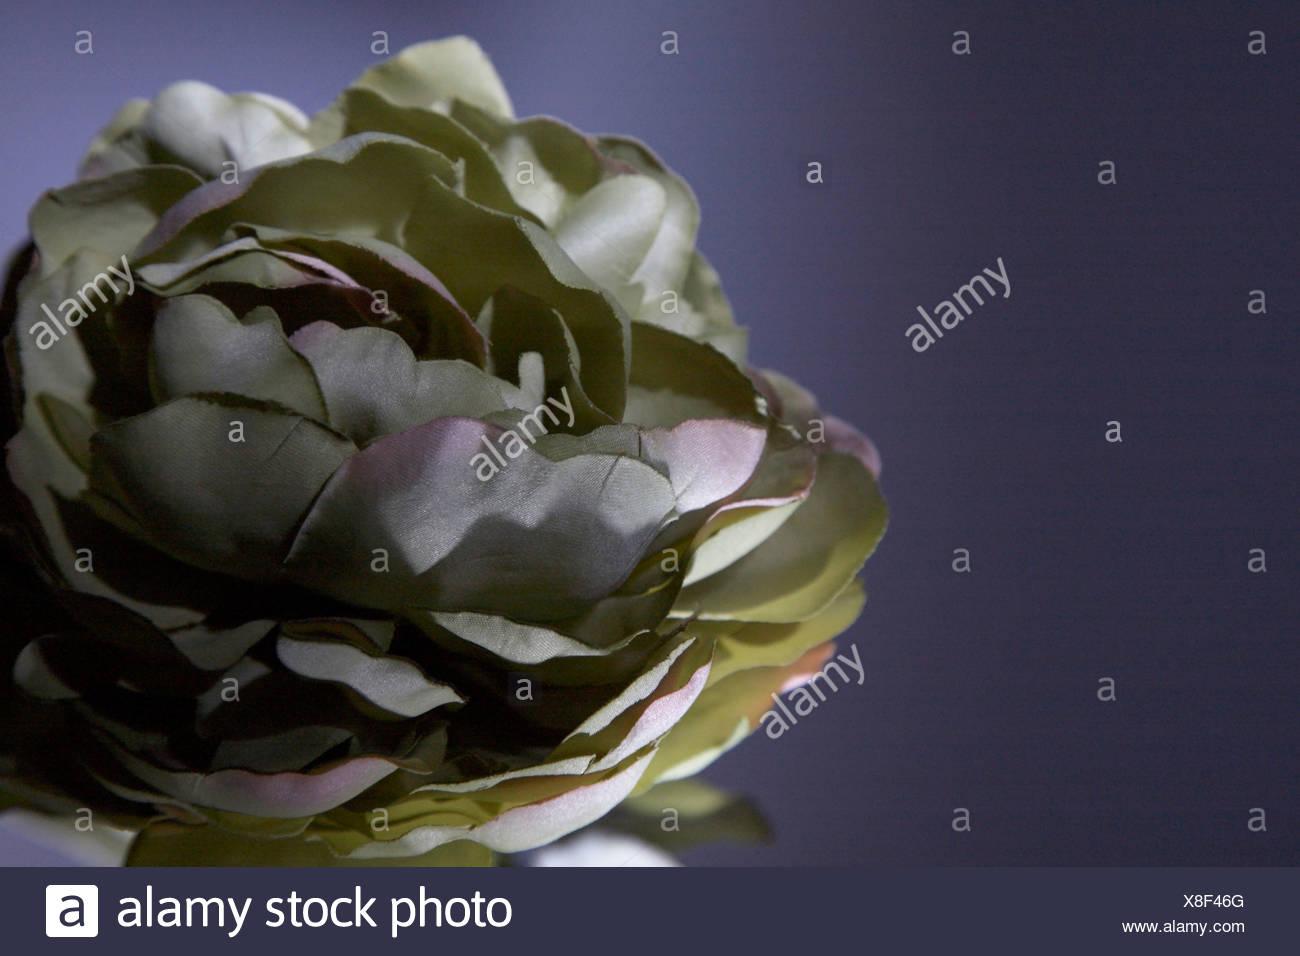 Silk Flower On Dark Background Stock Photo 280615736 Alamy